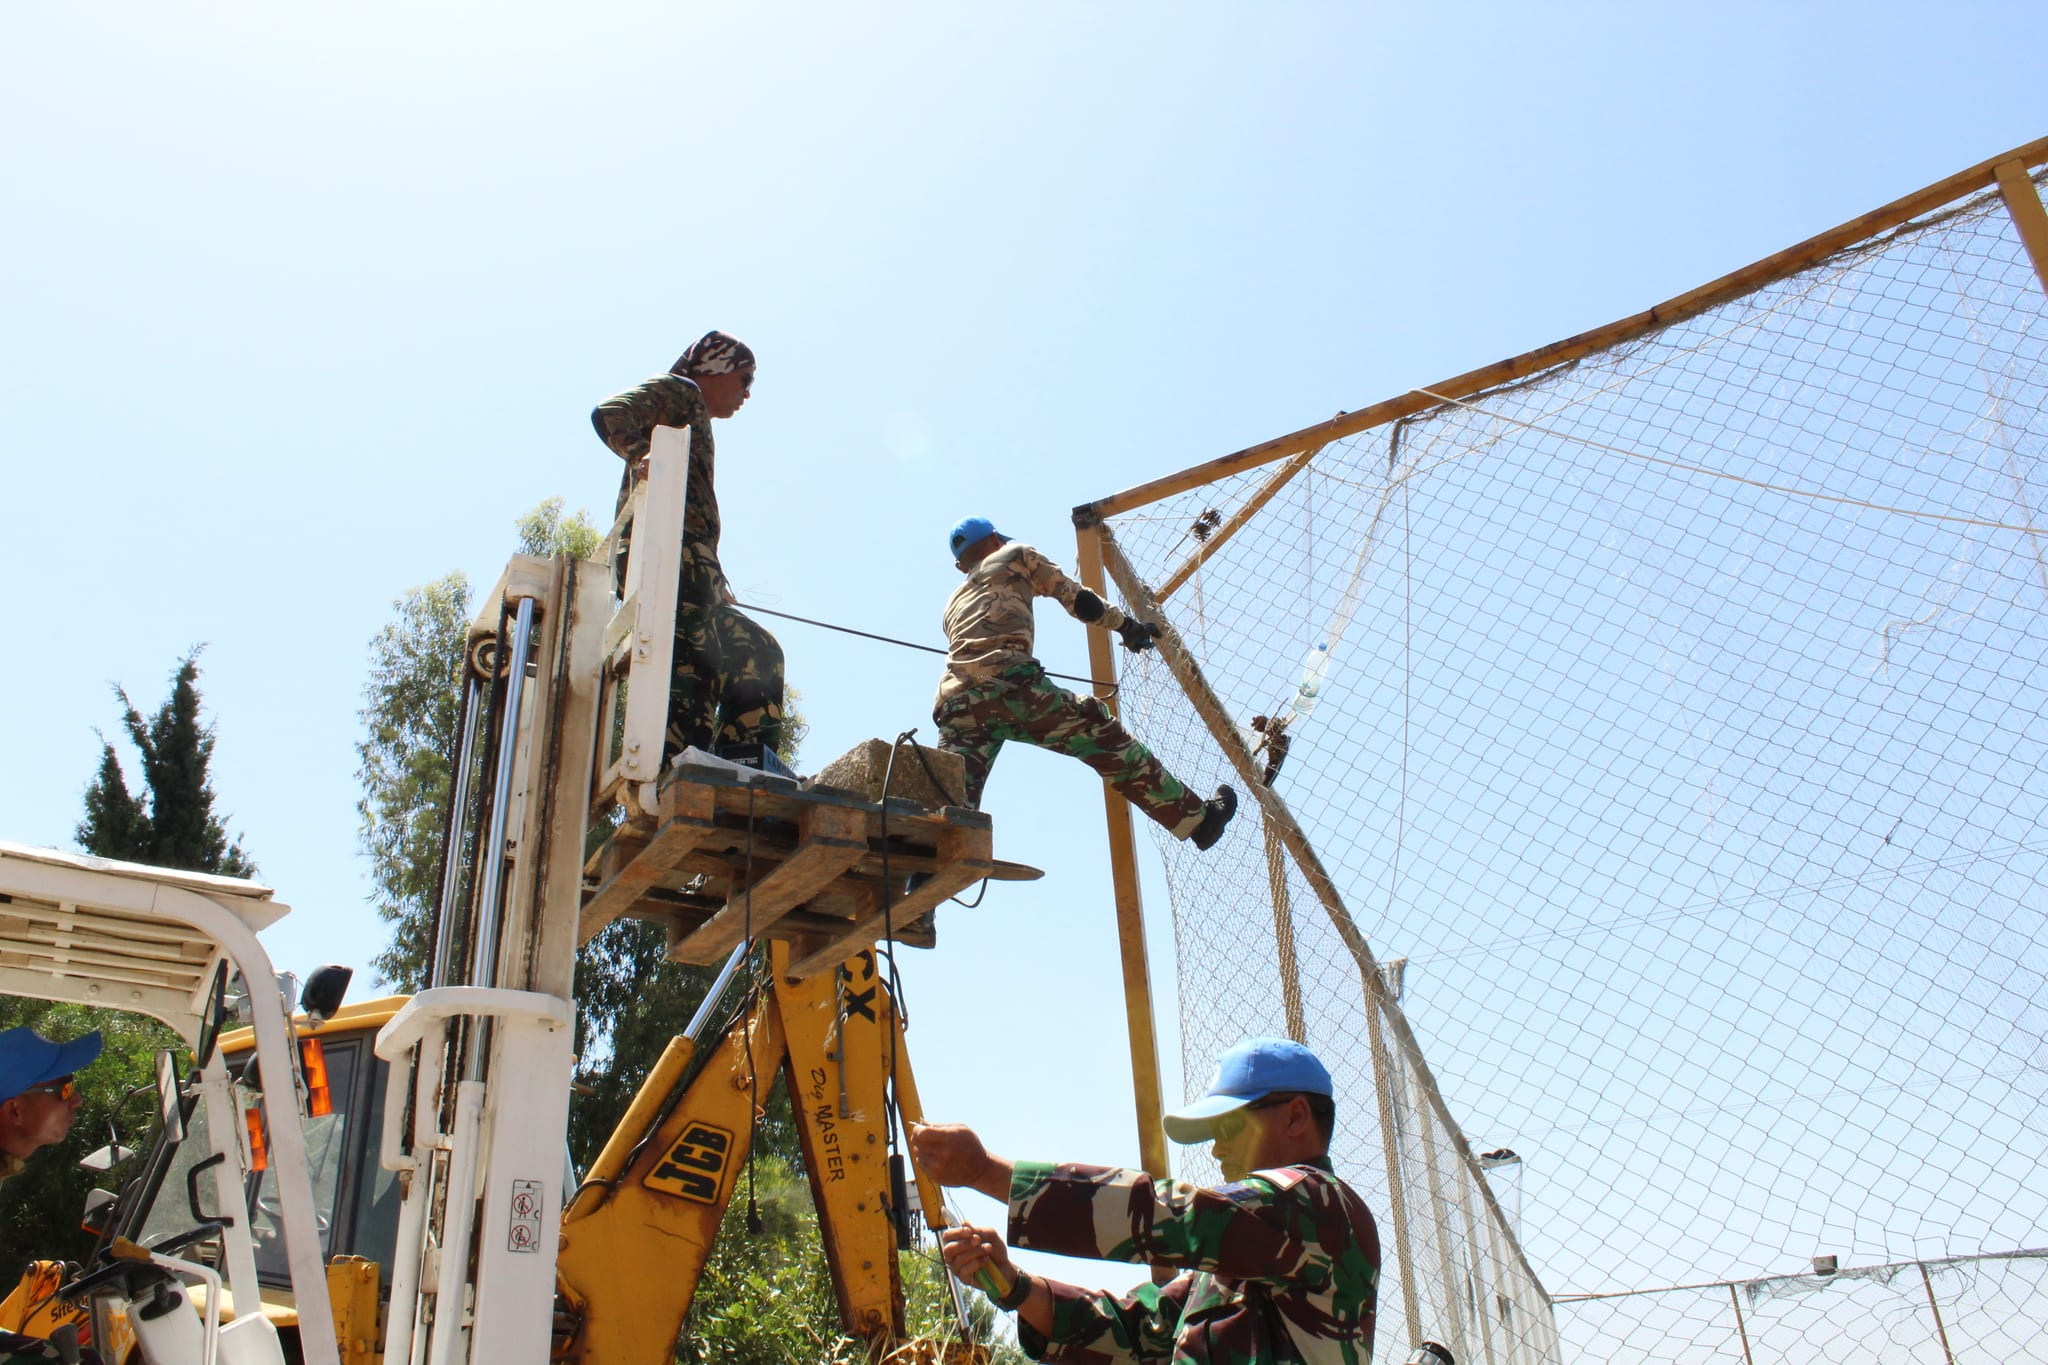 Karya Bakti Prajurit Indobatt Bantu Kesulitan Masyarakat Lebanon